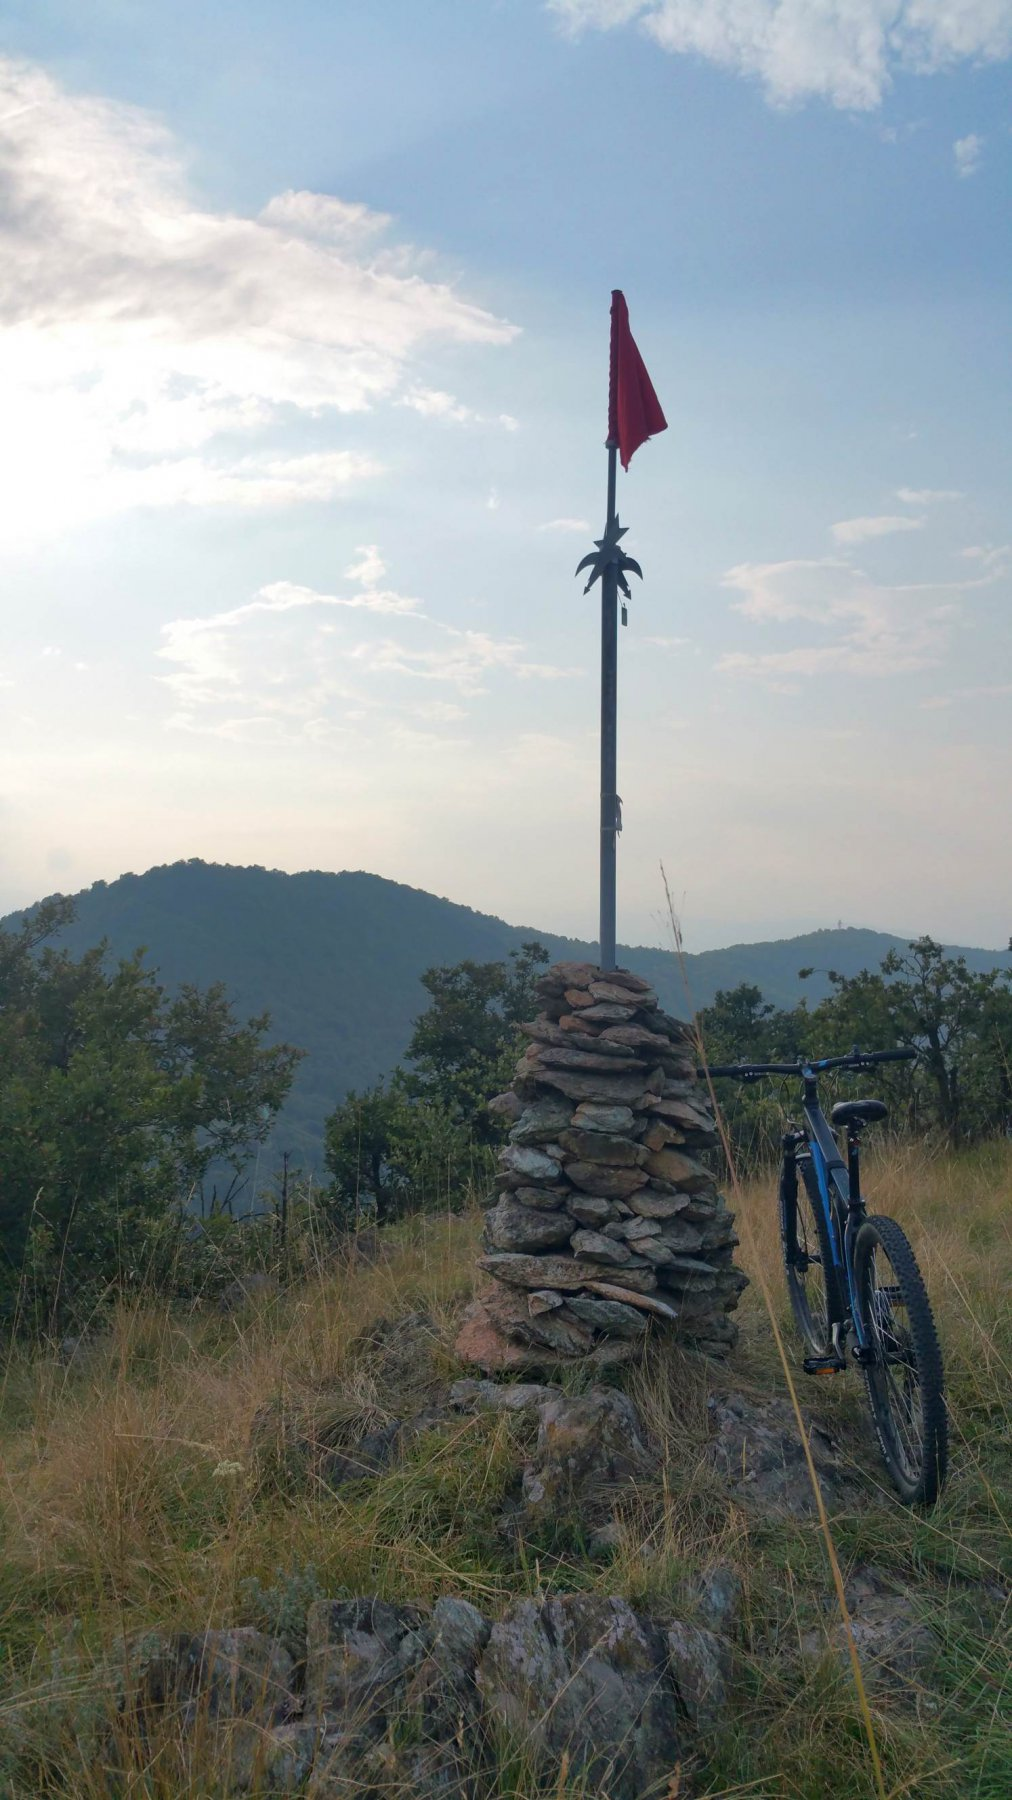 Monte Rubata Boe